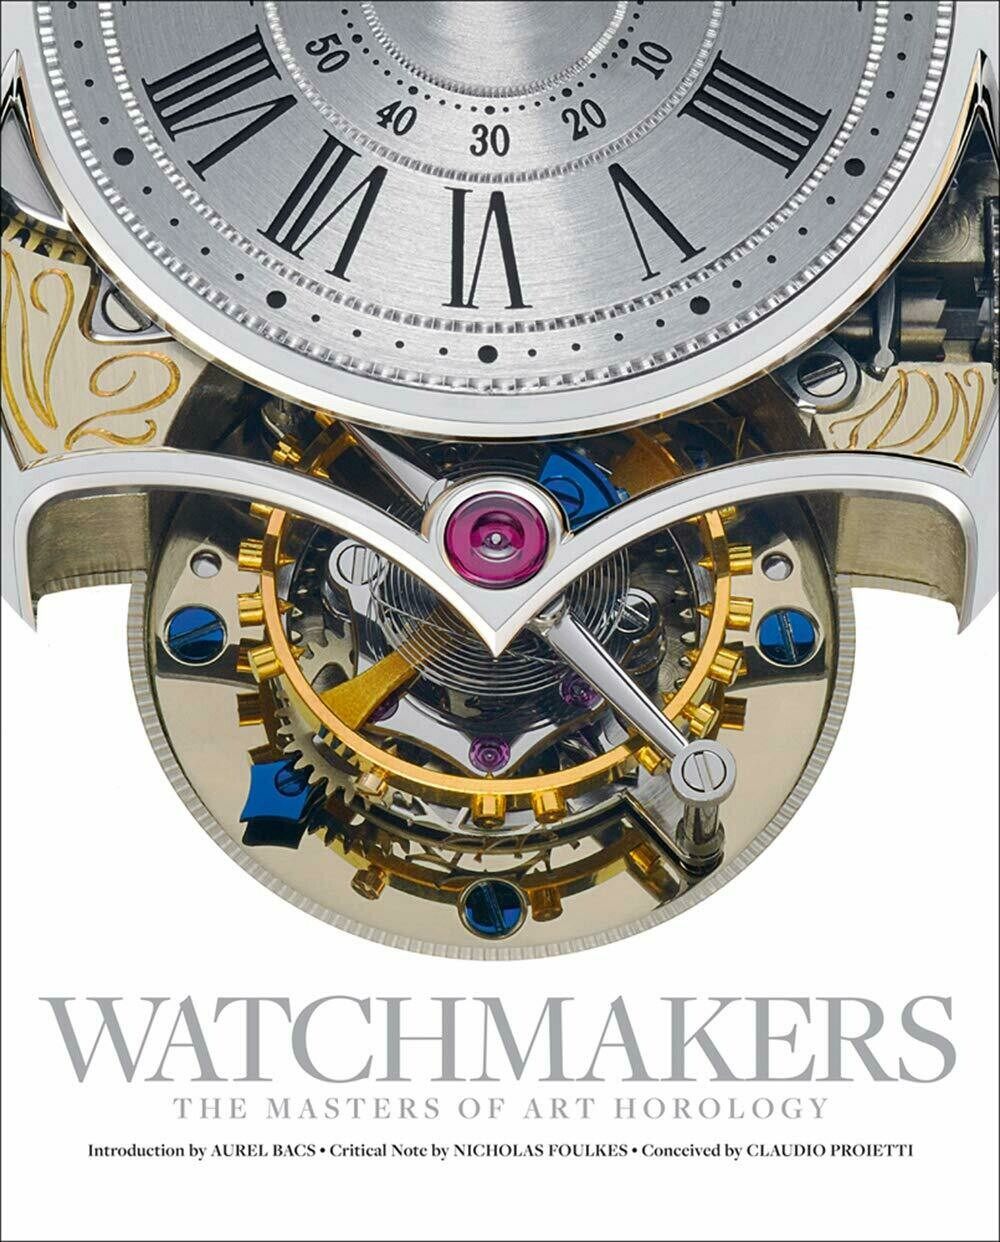 Watchmakers: Art Horology